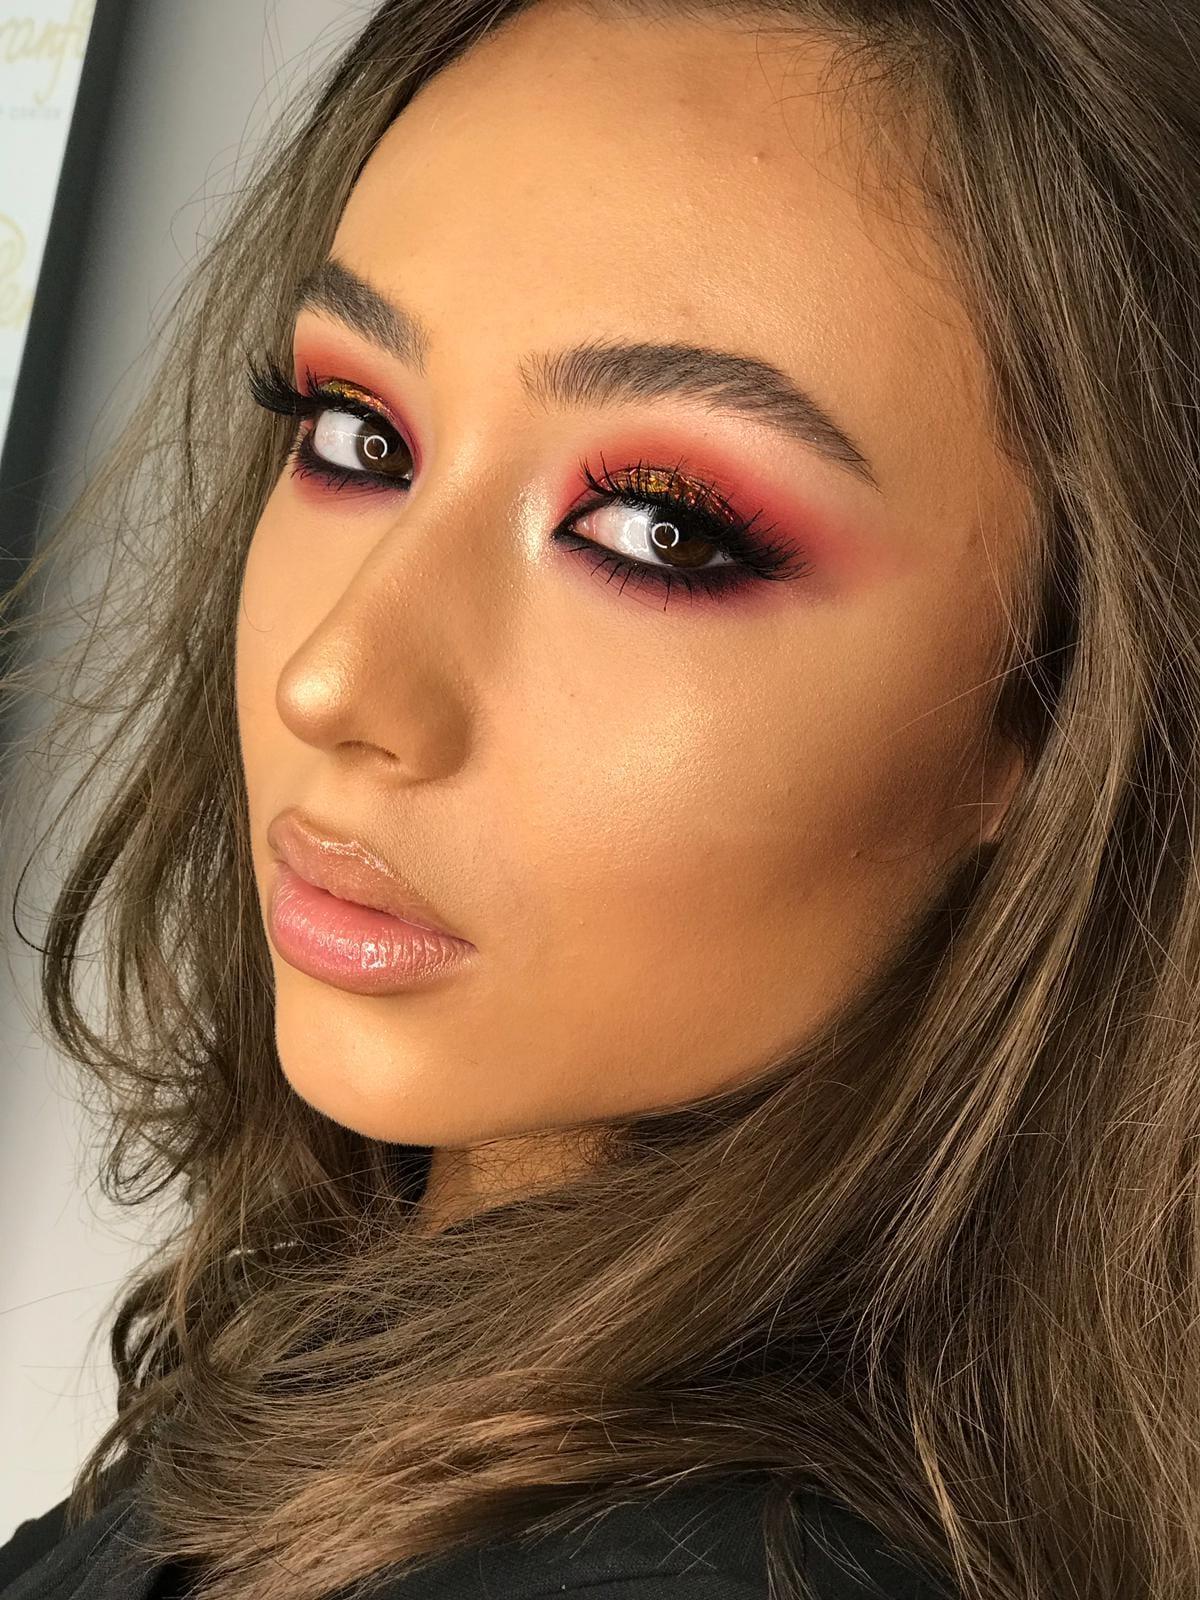 Curs acreditat Professional make-up